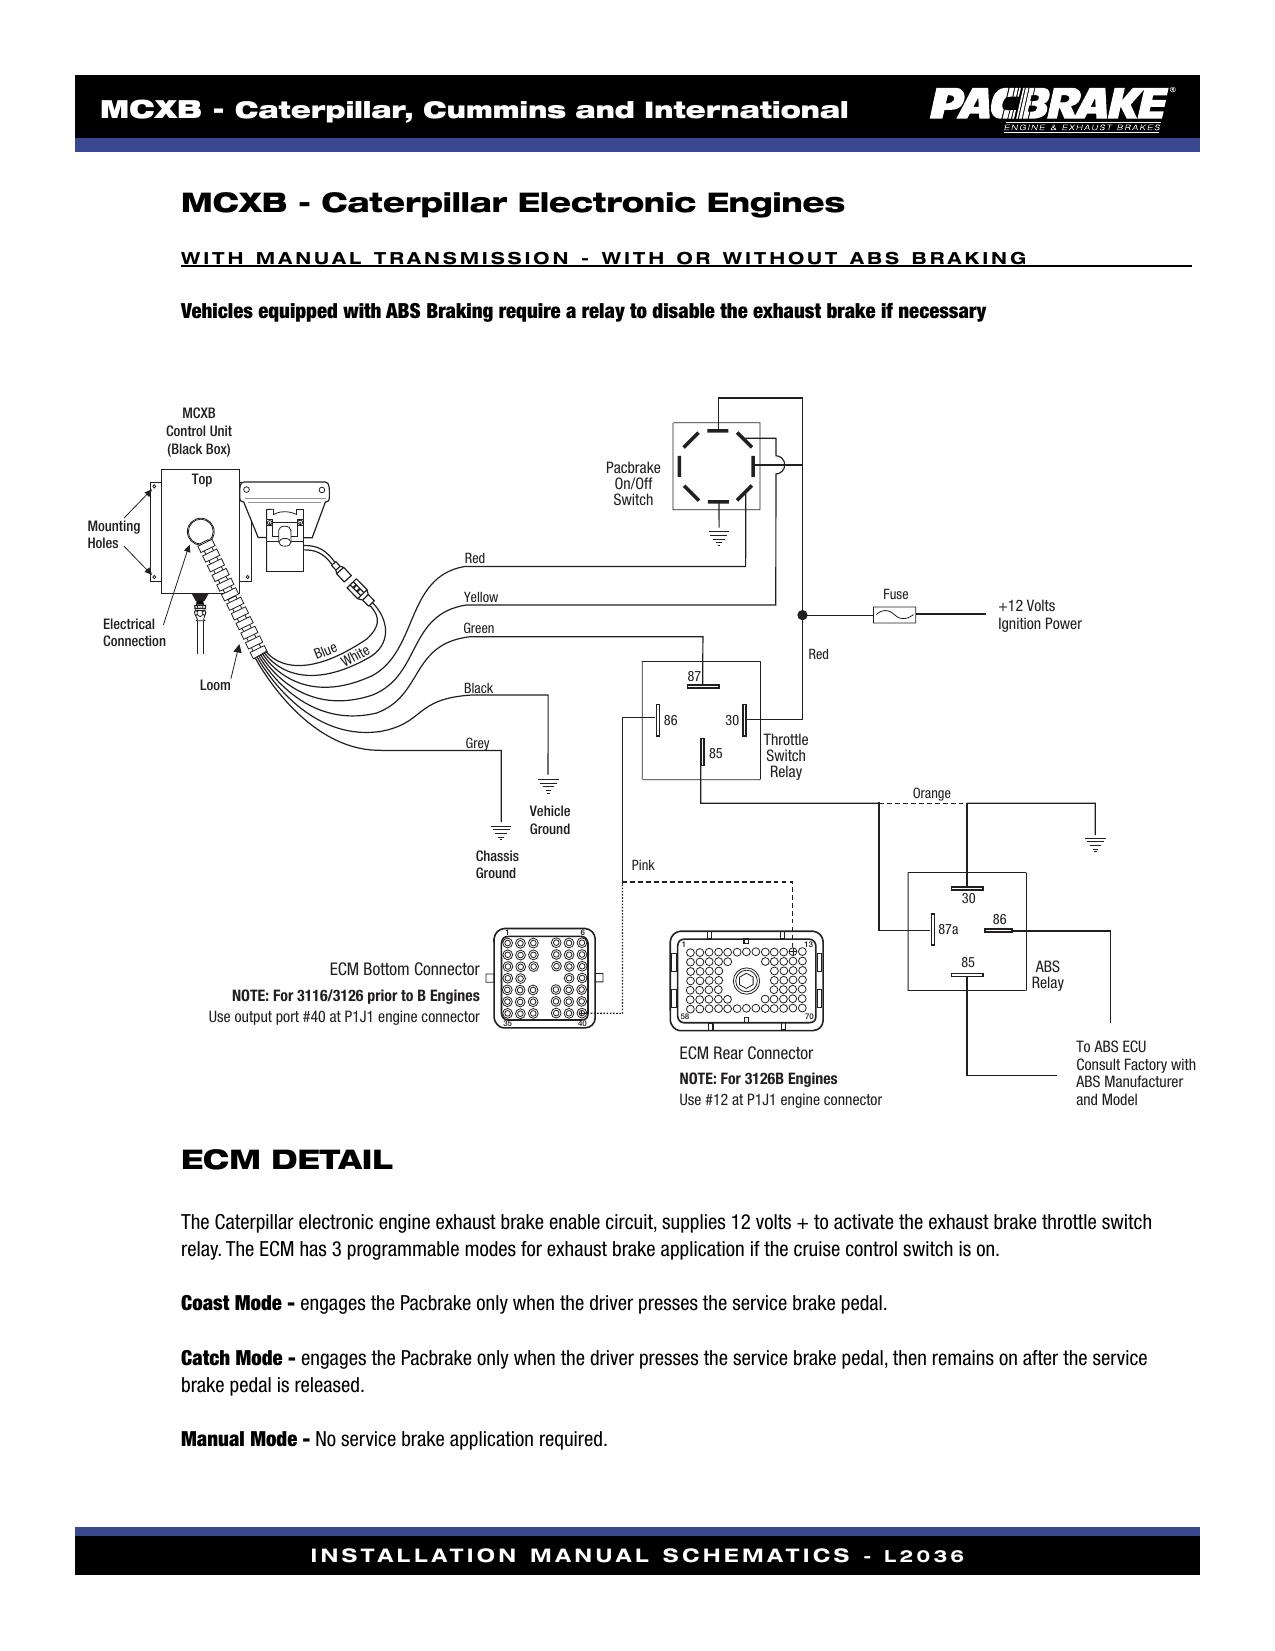 Pacbrake Wiring Diagram Dodge from s1.manualzz.com